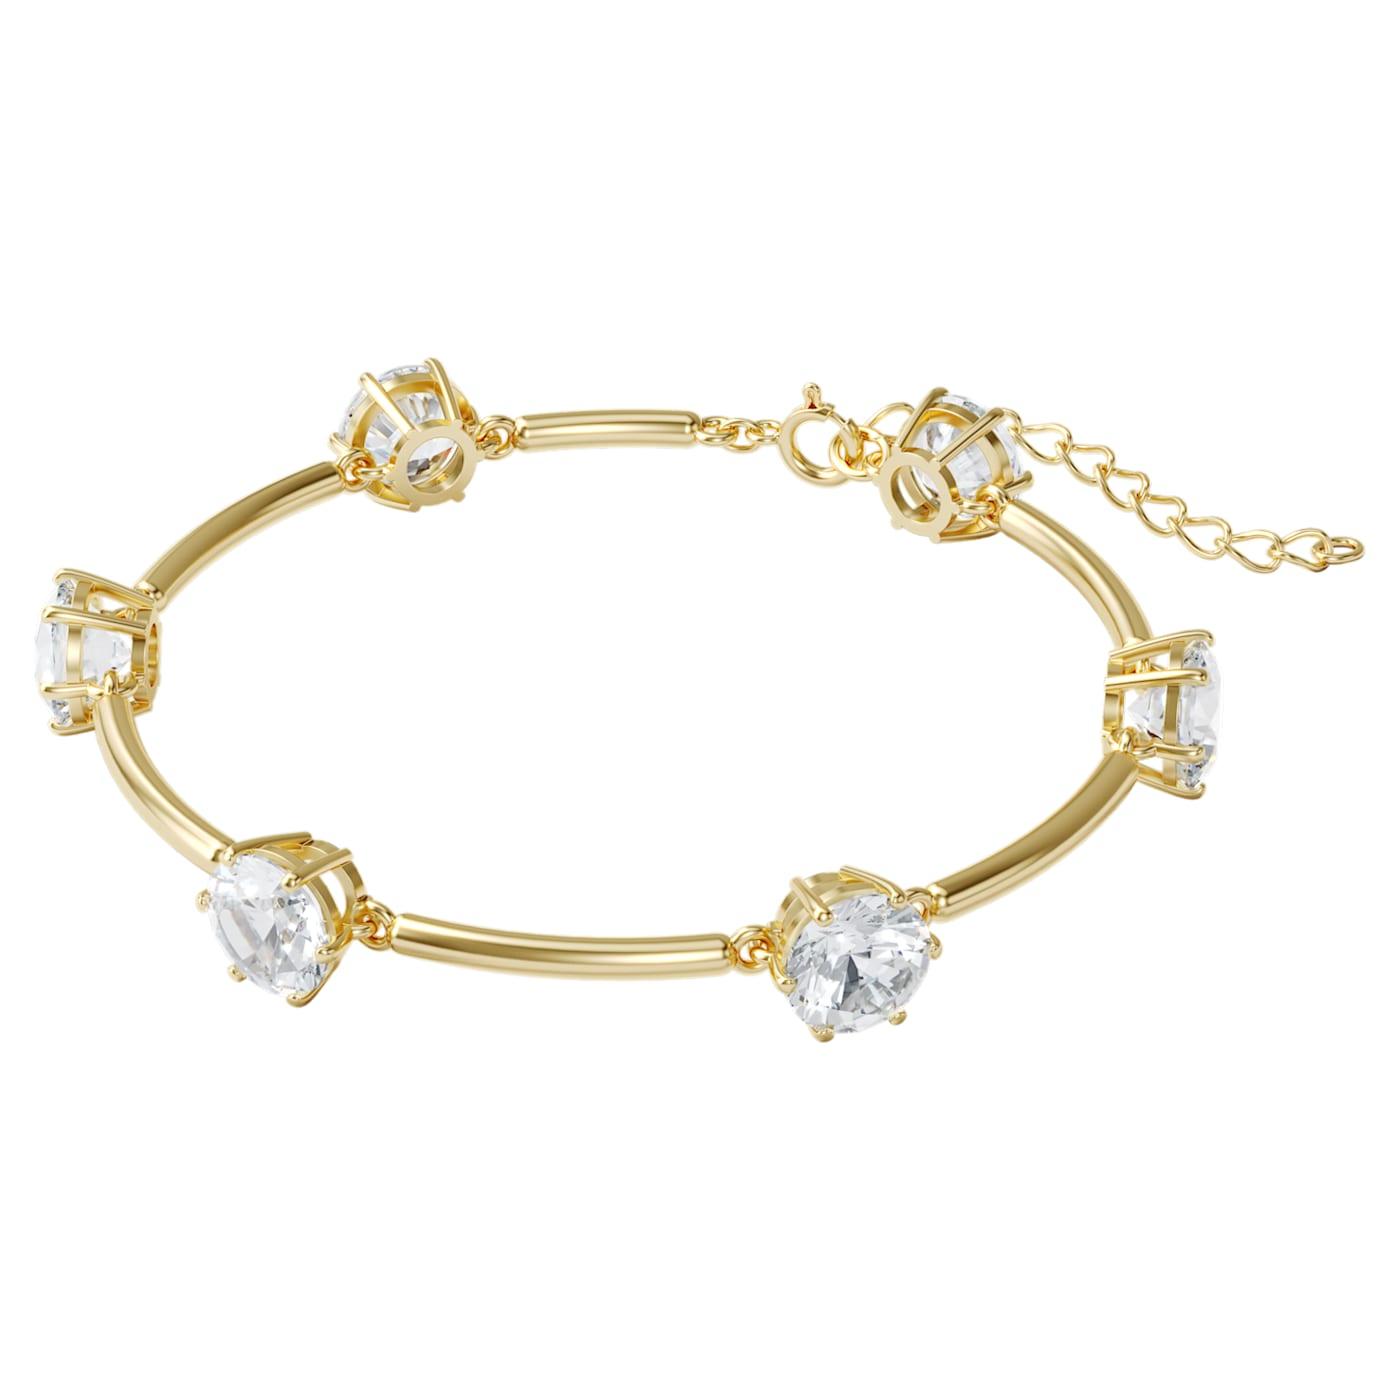 Bracelet Constella Blanc, Métal doré, Swarovski